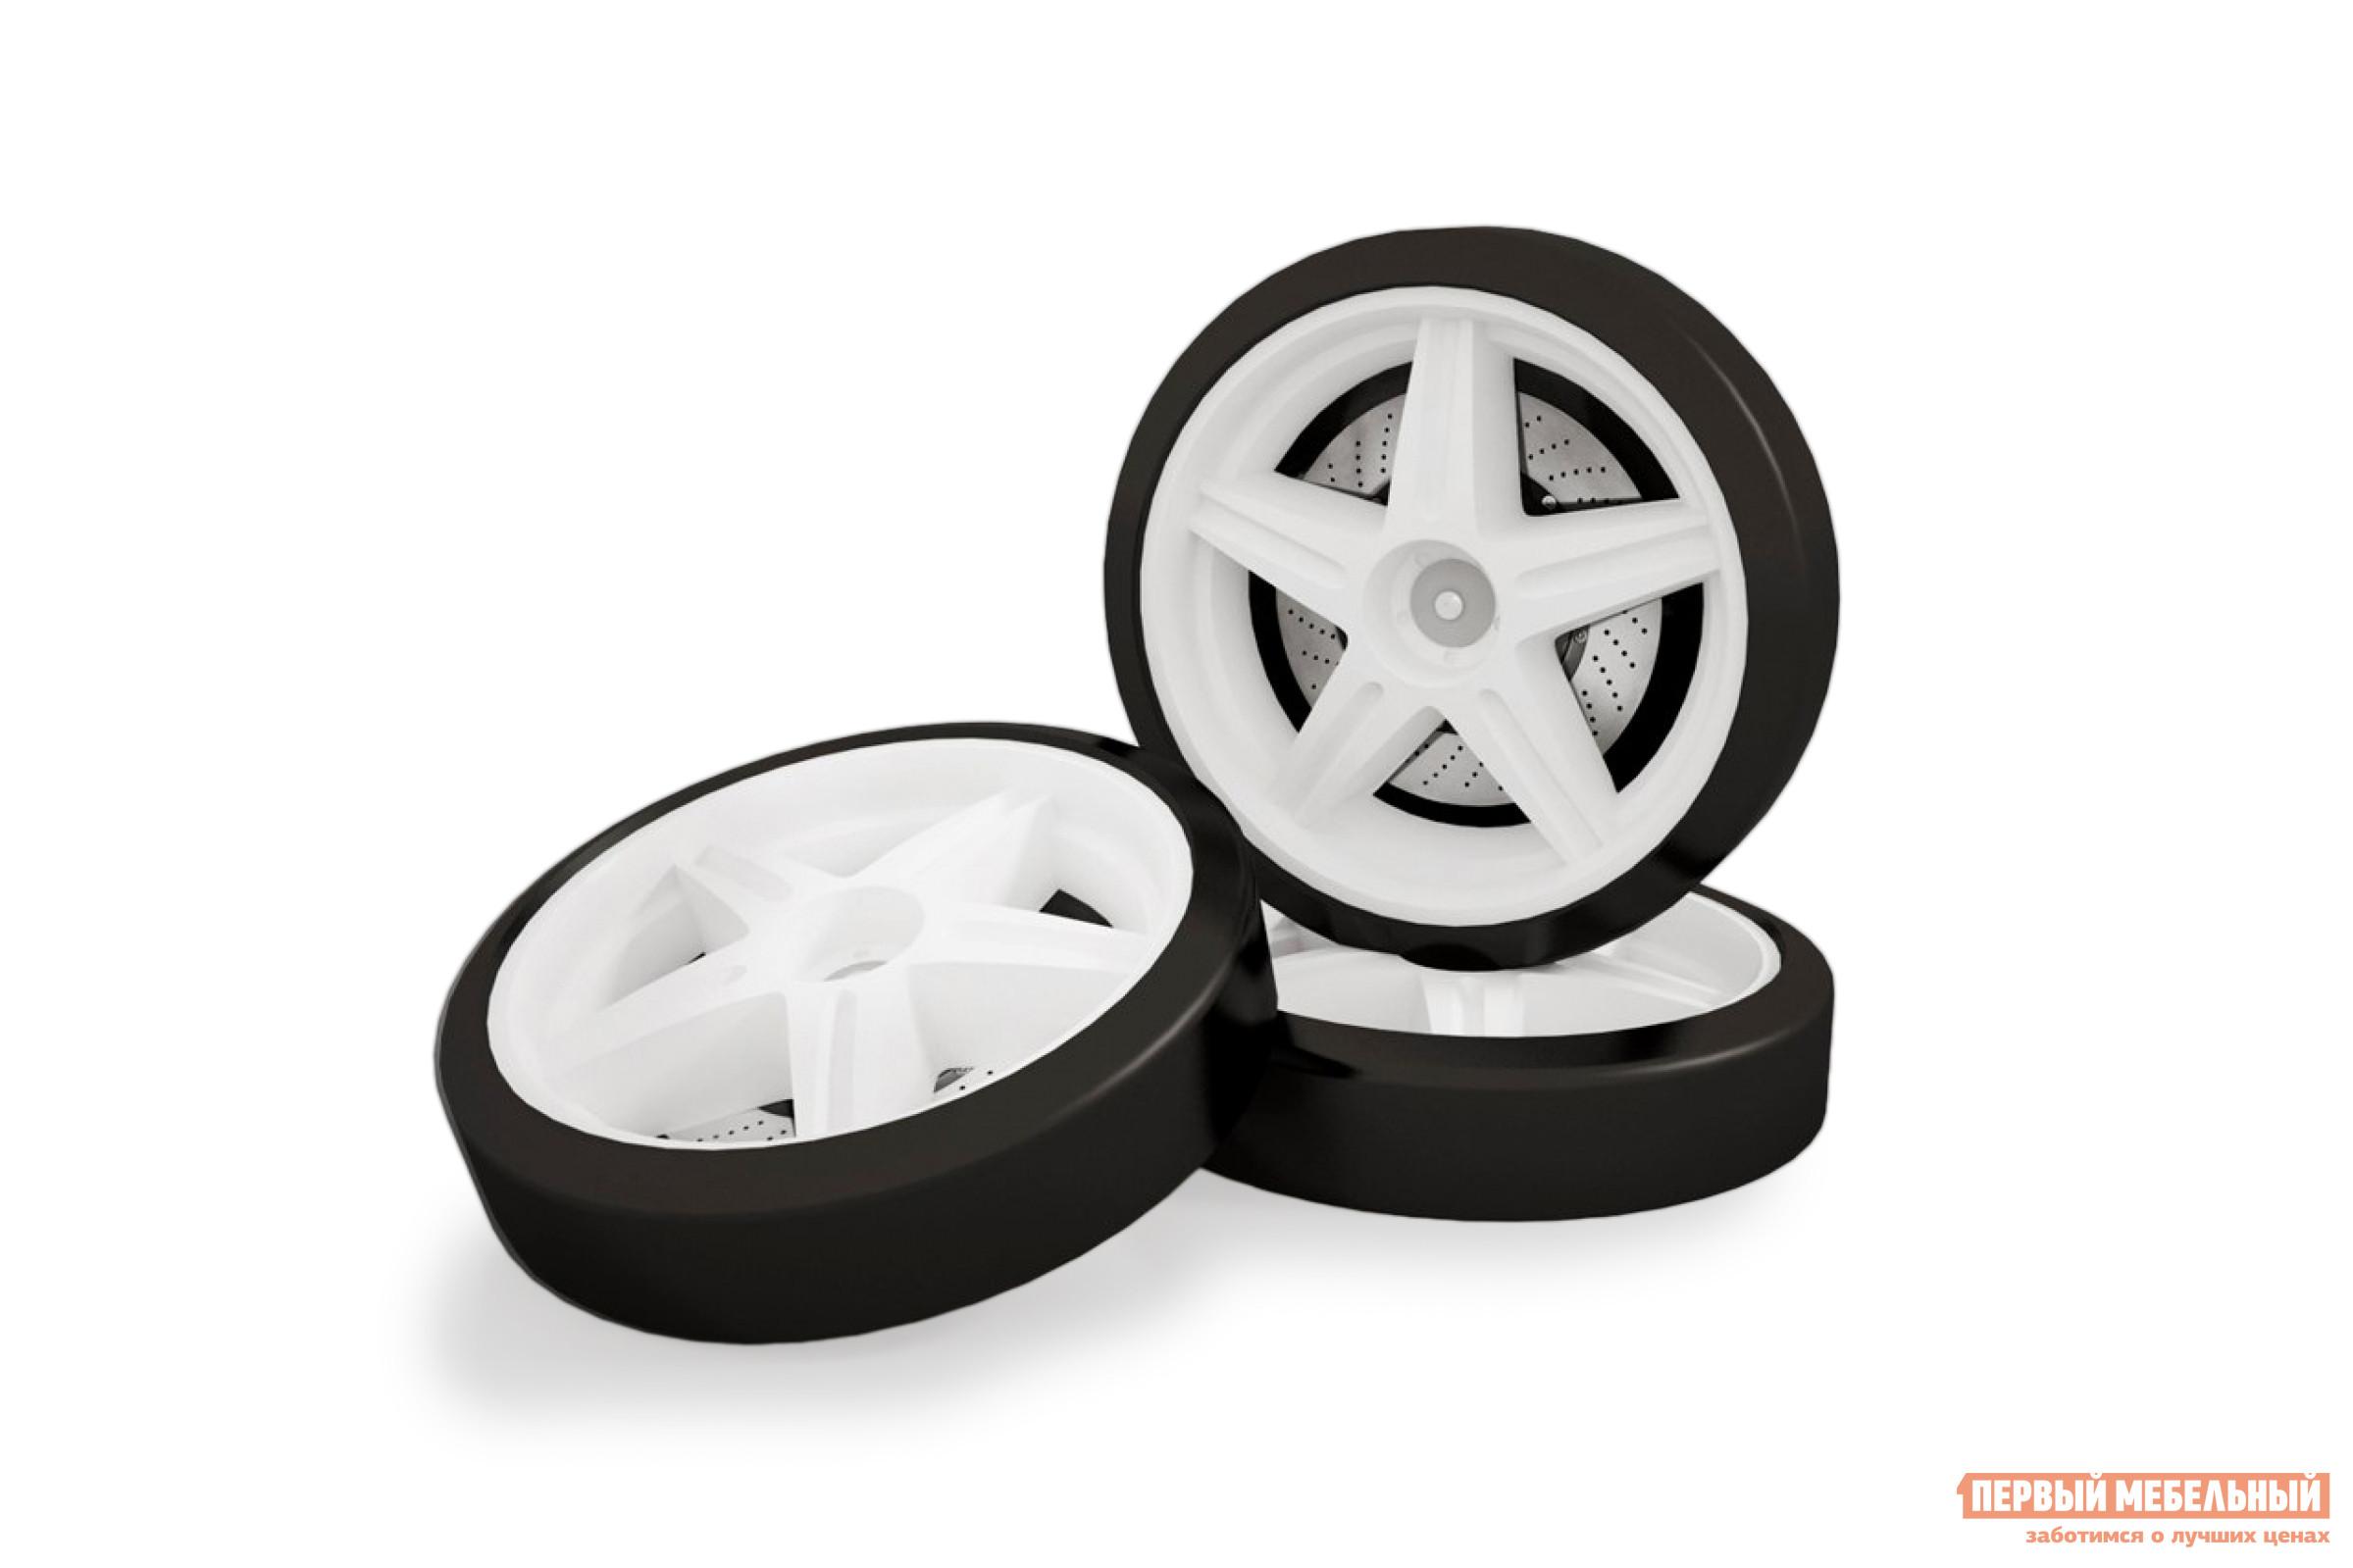 Накладные колеса Bed-mobile Накладные колеса с дисками для Ауди А4/ Мустанг/Камаро, 2 шт